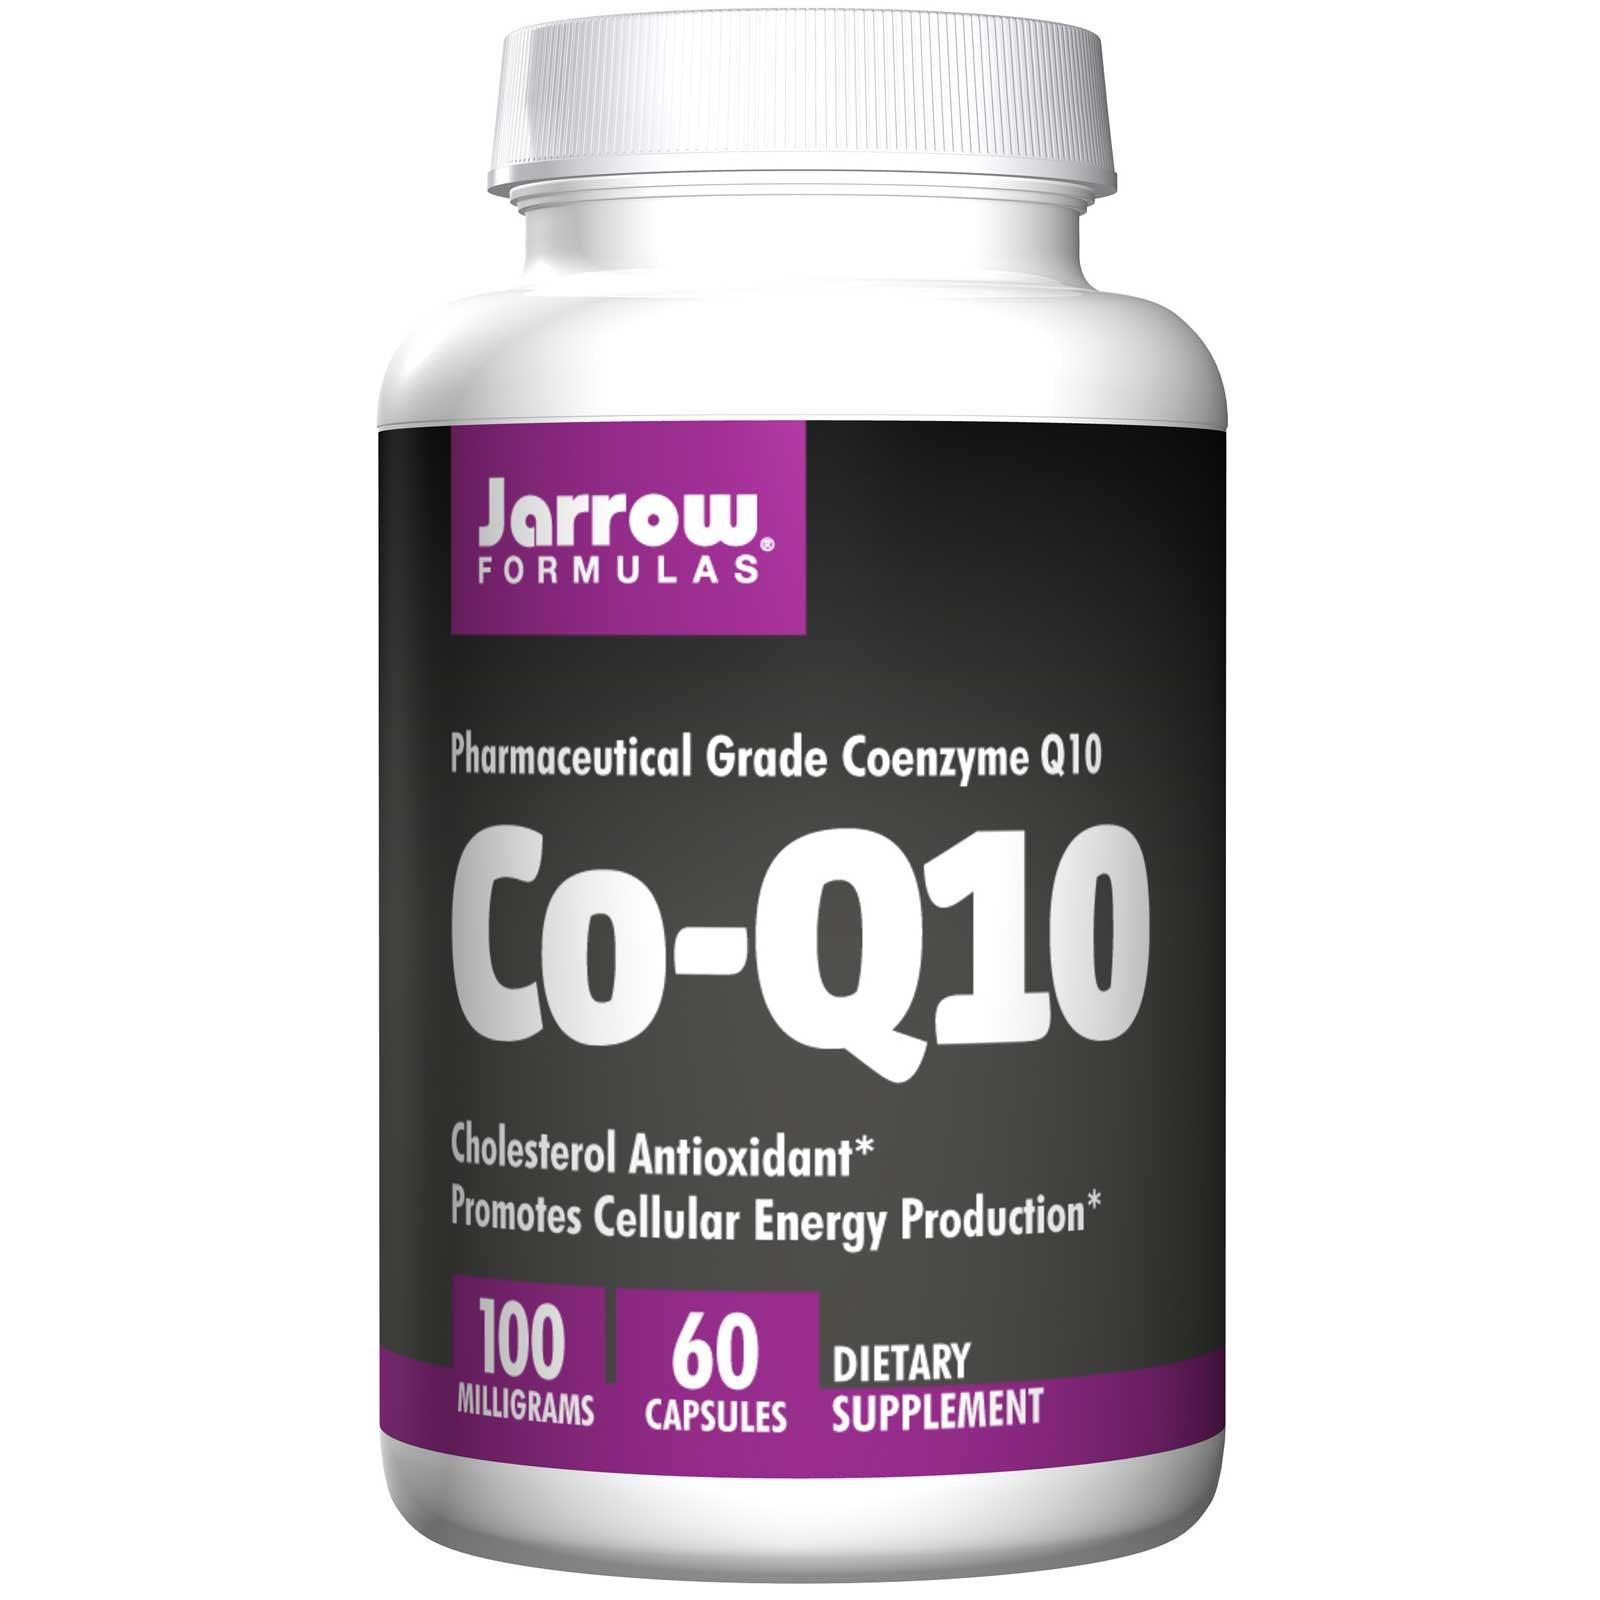 Image of Co-Q10 100 mg (60 capsule) - Jarrow Formulas 0790011060031